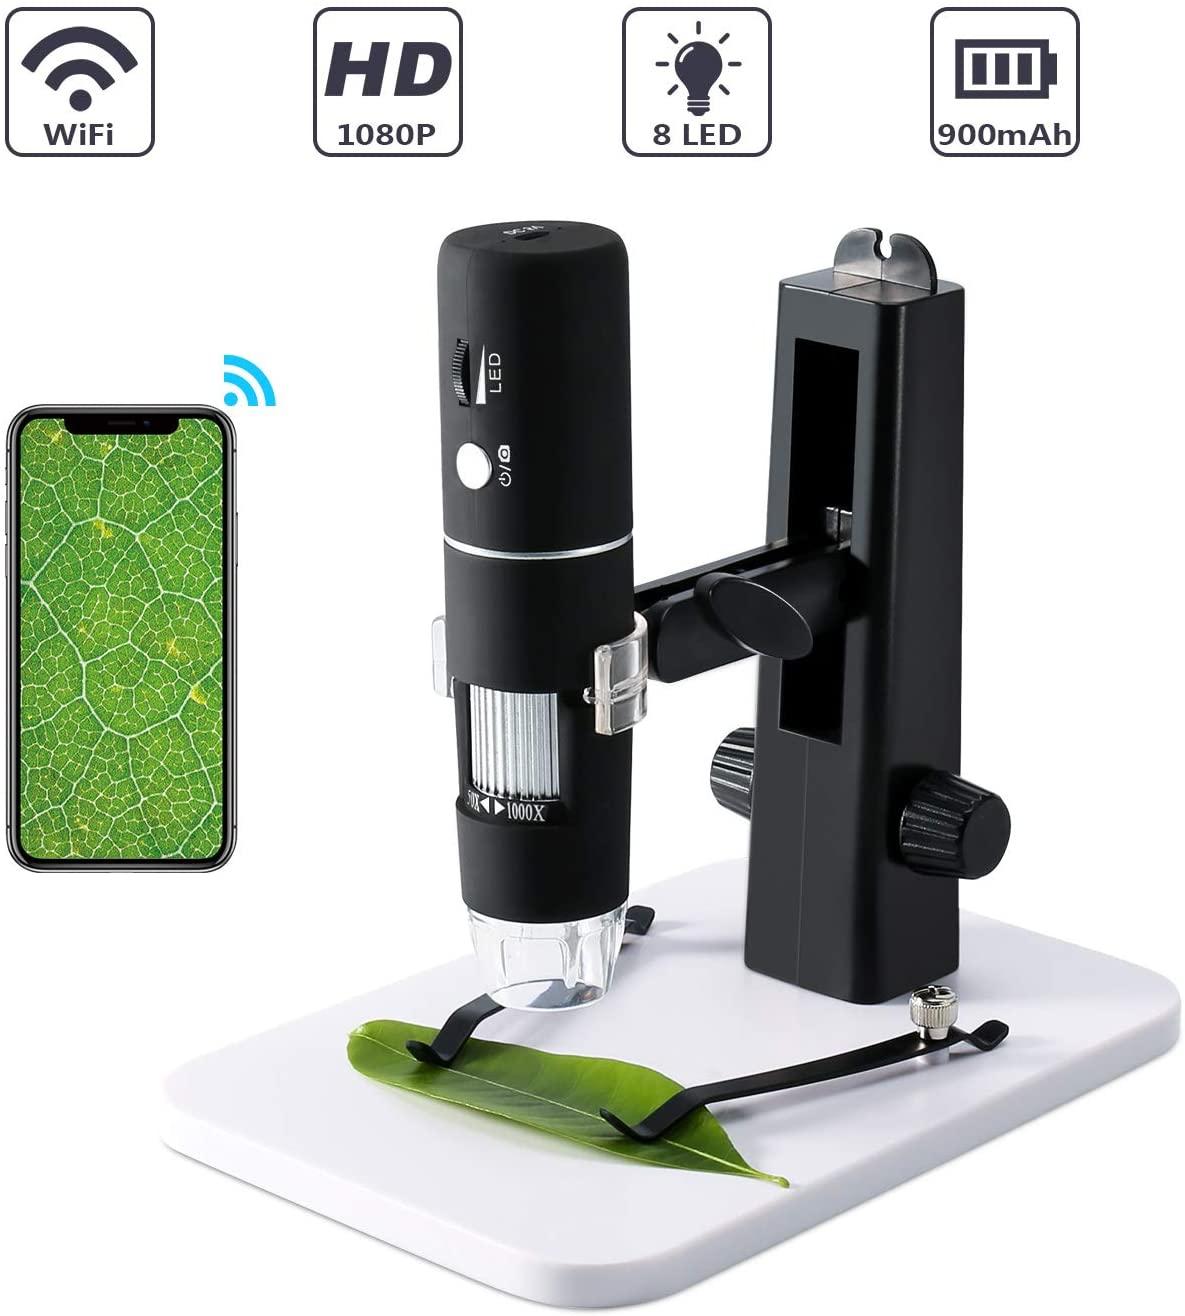 Microscopio Digital, ROTEK WiFi Microscopio USB 1000x 1080P HD para Niños con Soporte de Elevación Profesional, Mini Microscopio Endoscopio Camara con 8 LED para iPhone iOS Android iPad Windows, Mac